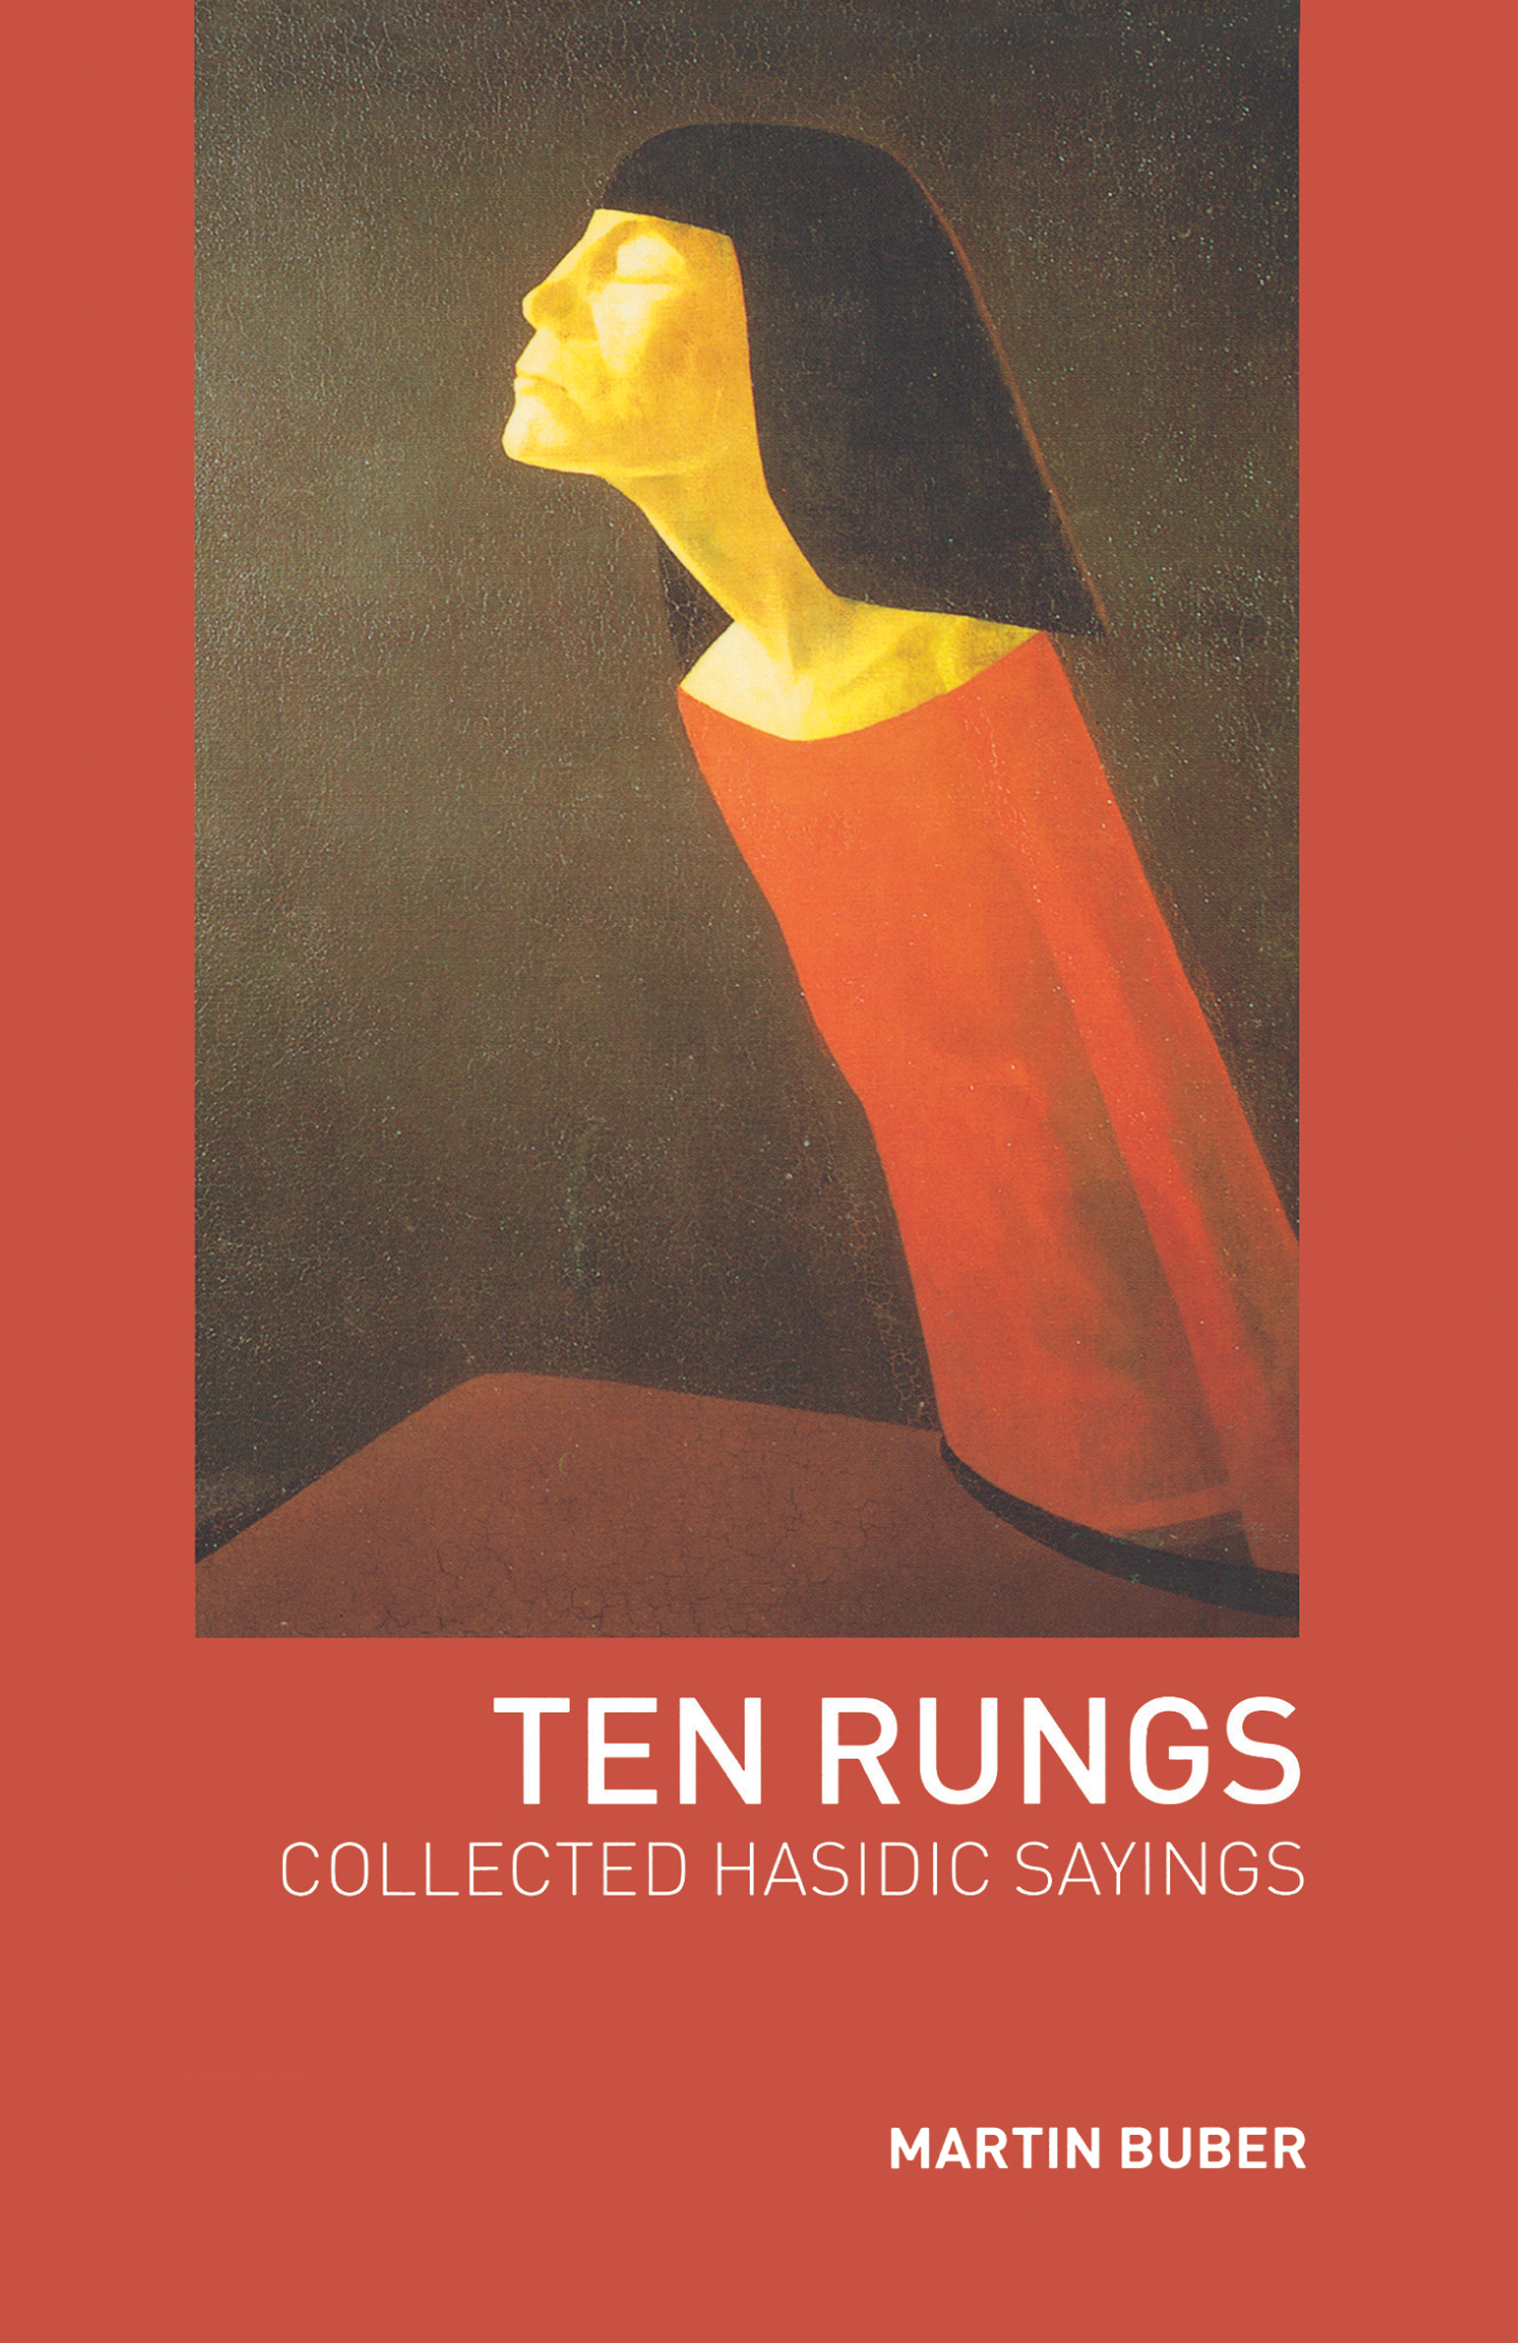 Ten Rungs: Collected Hasidic Sayings book cover